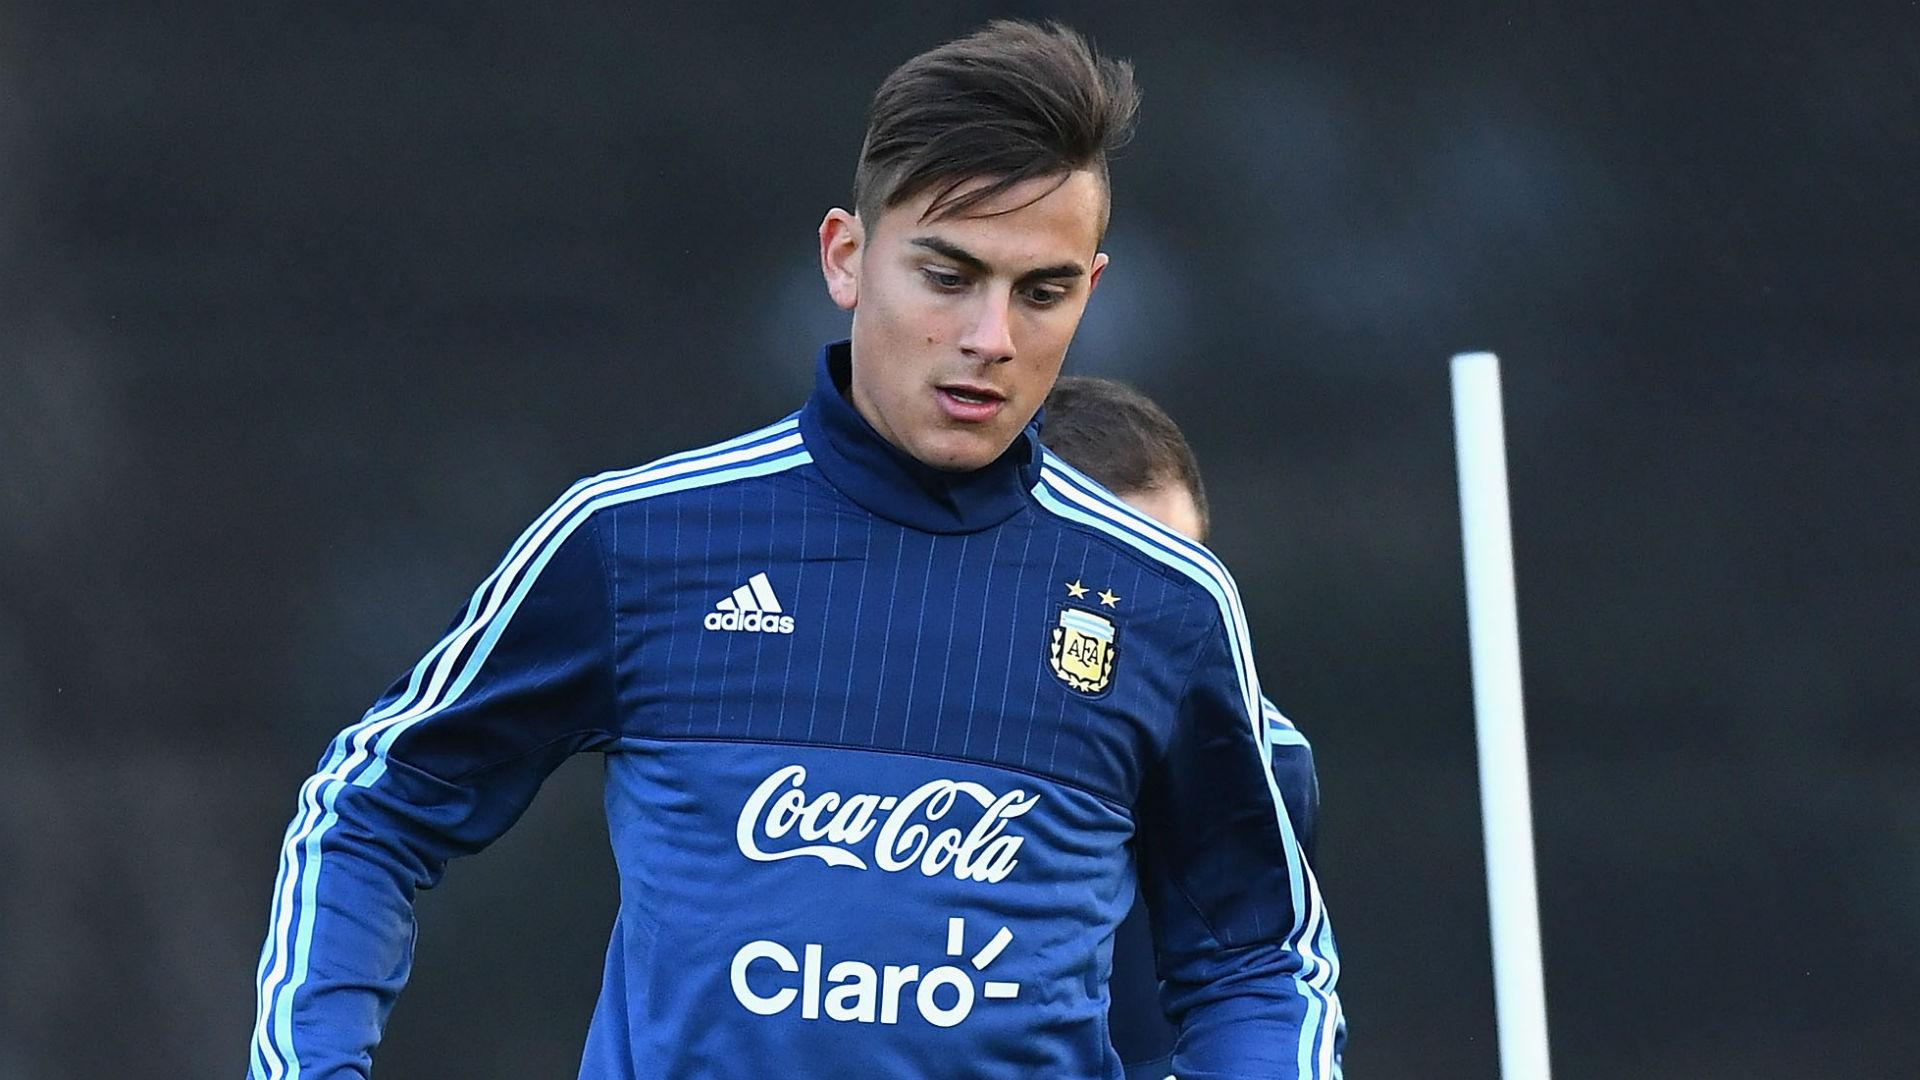 Pauolo Dybala - Juventus and Argentina forward